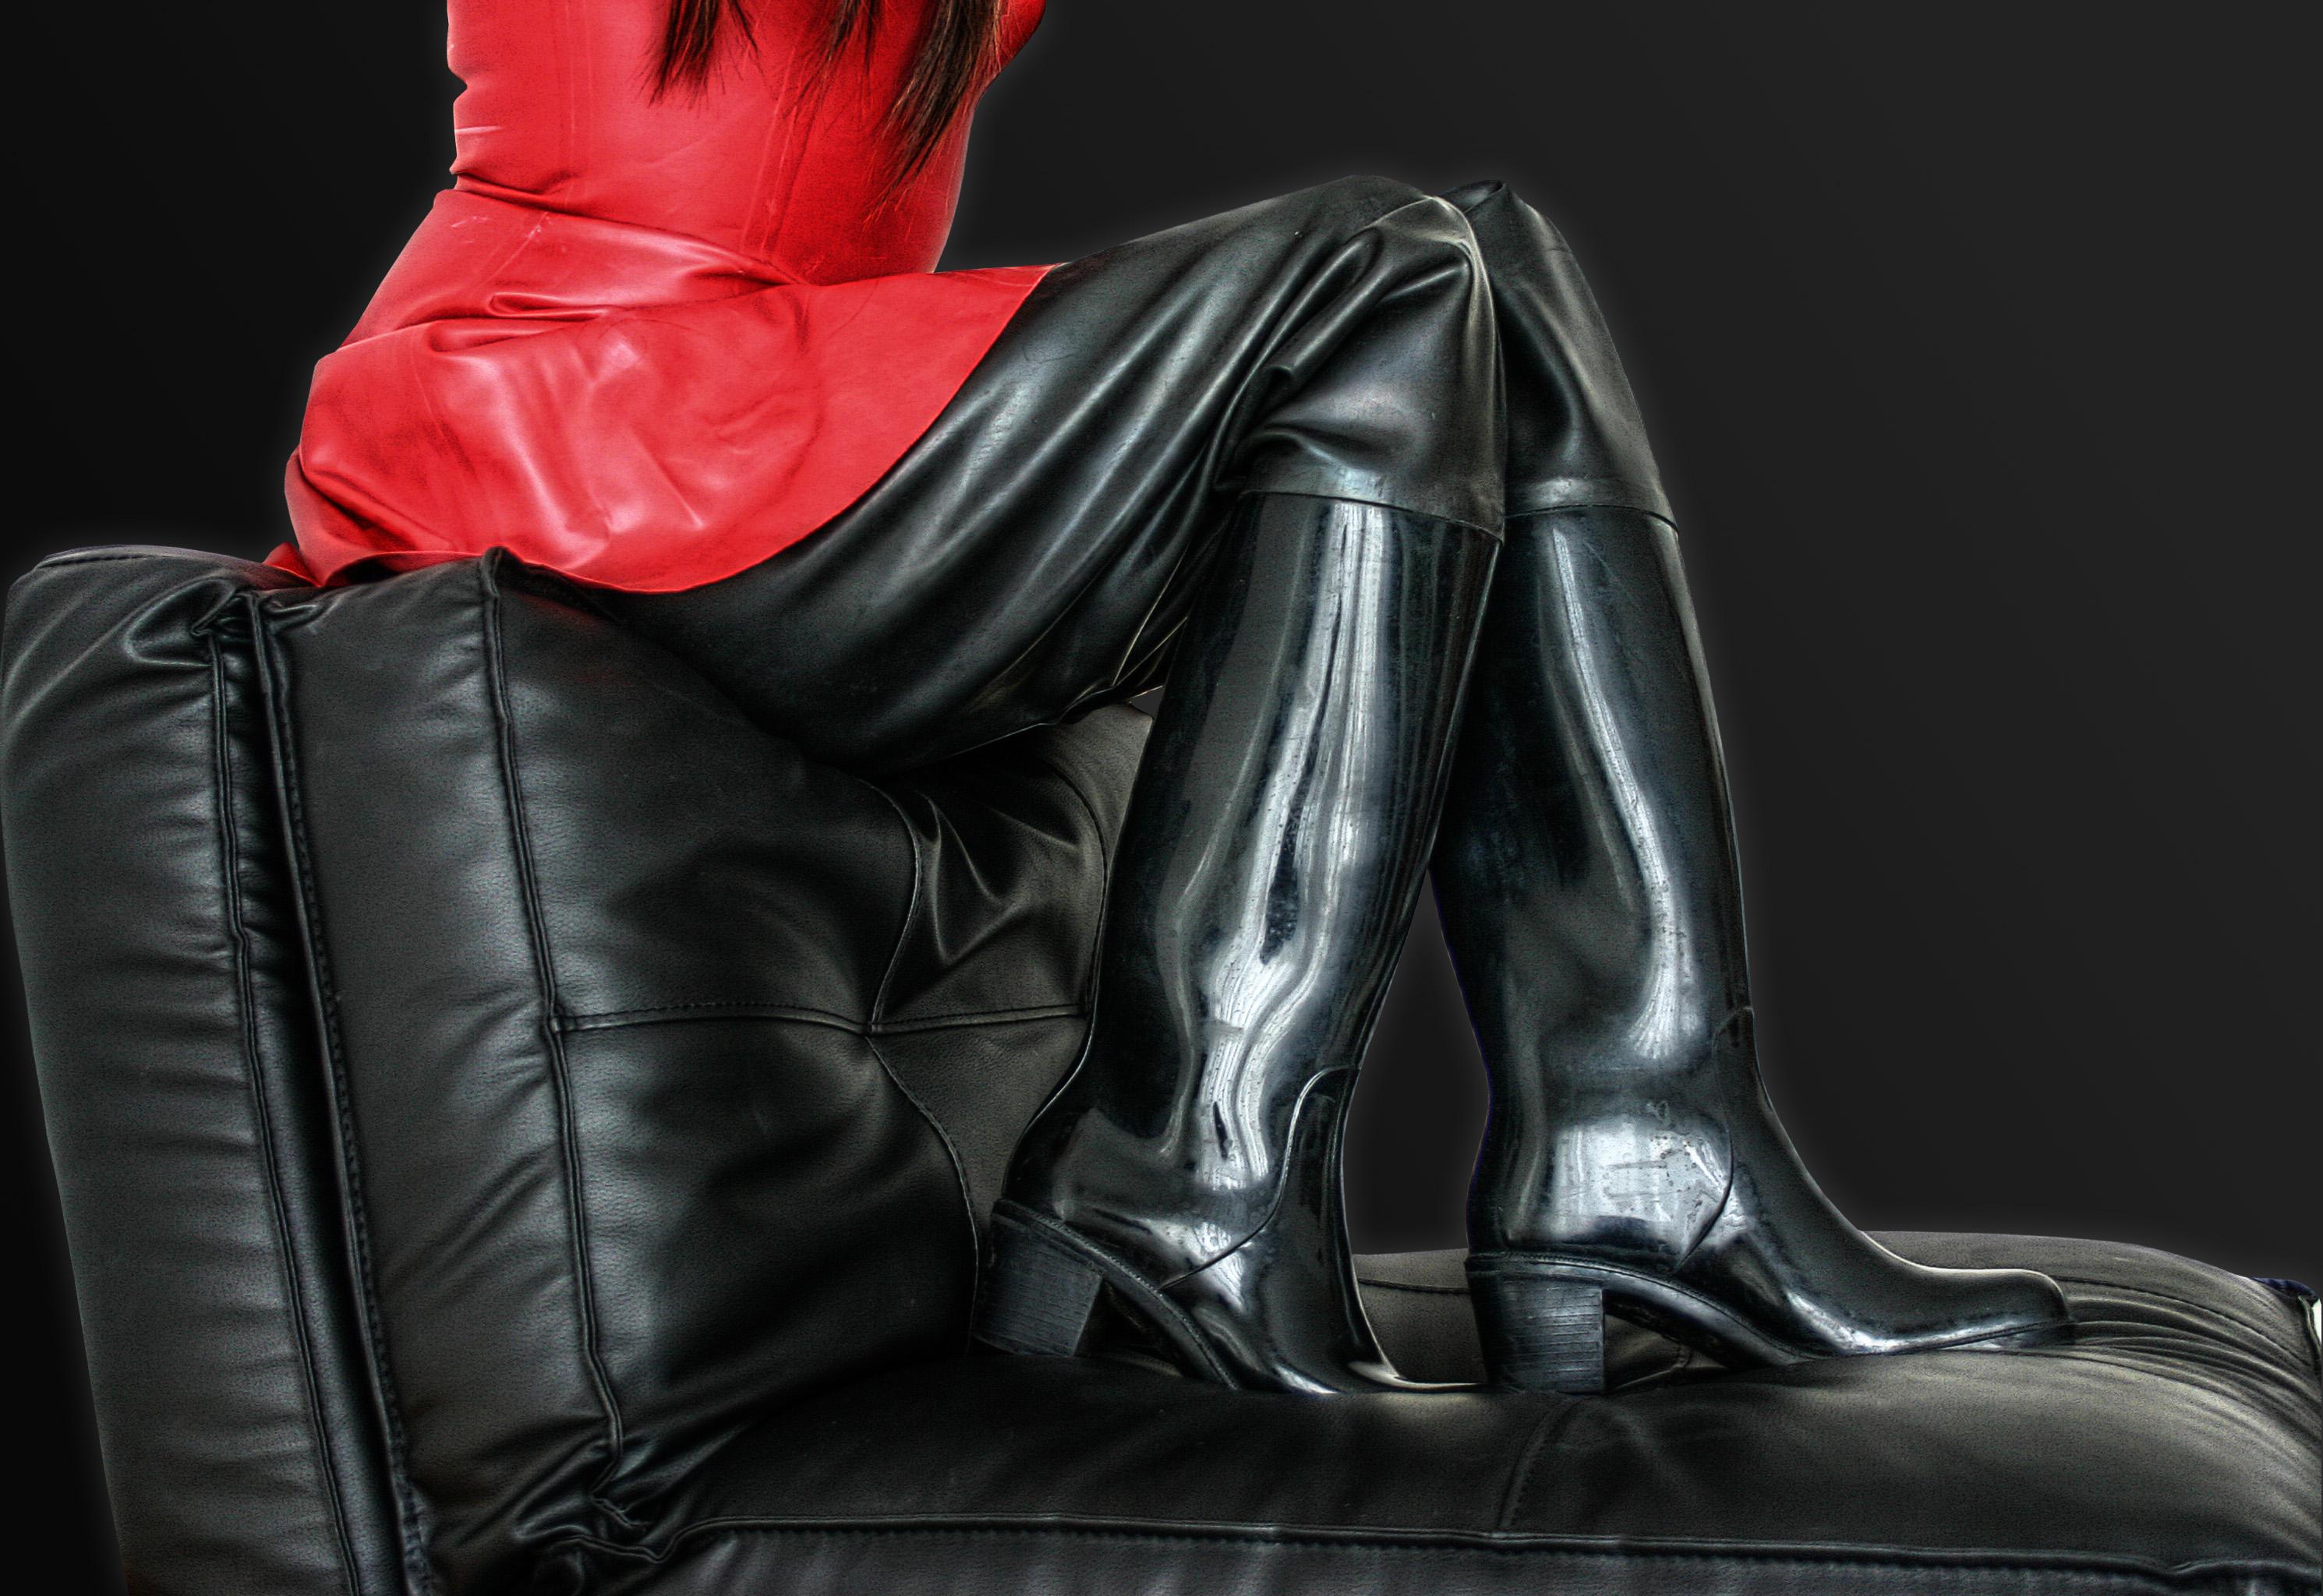 Wallpaper Boots Stiefel Gummistiefel Rubberboots